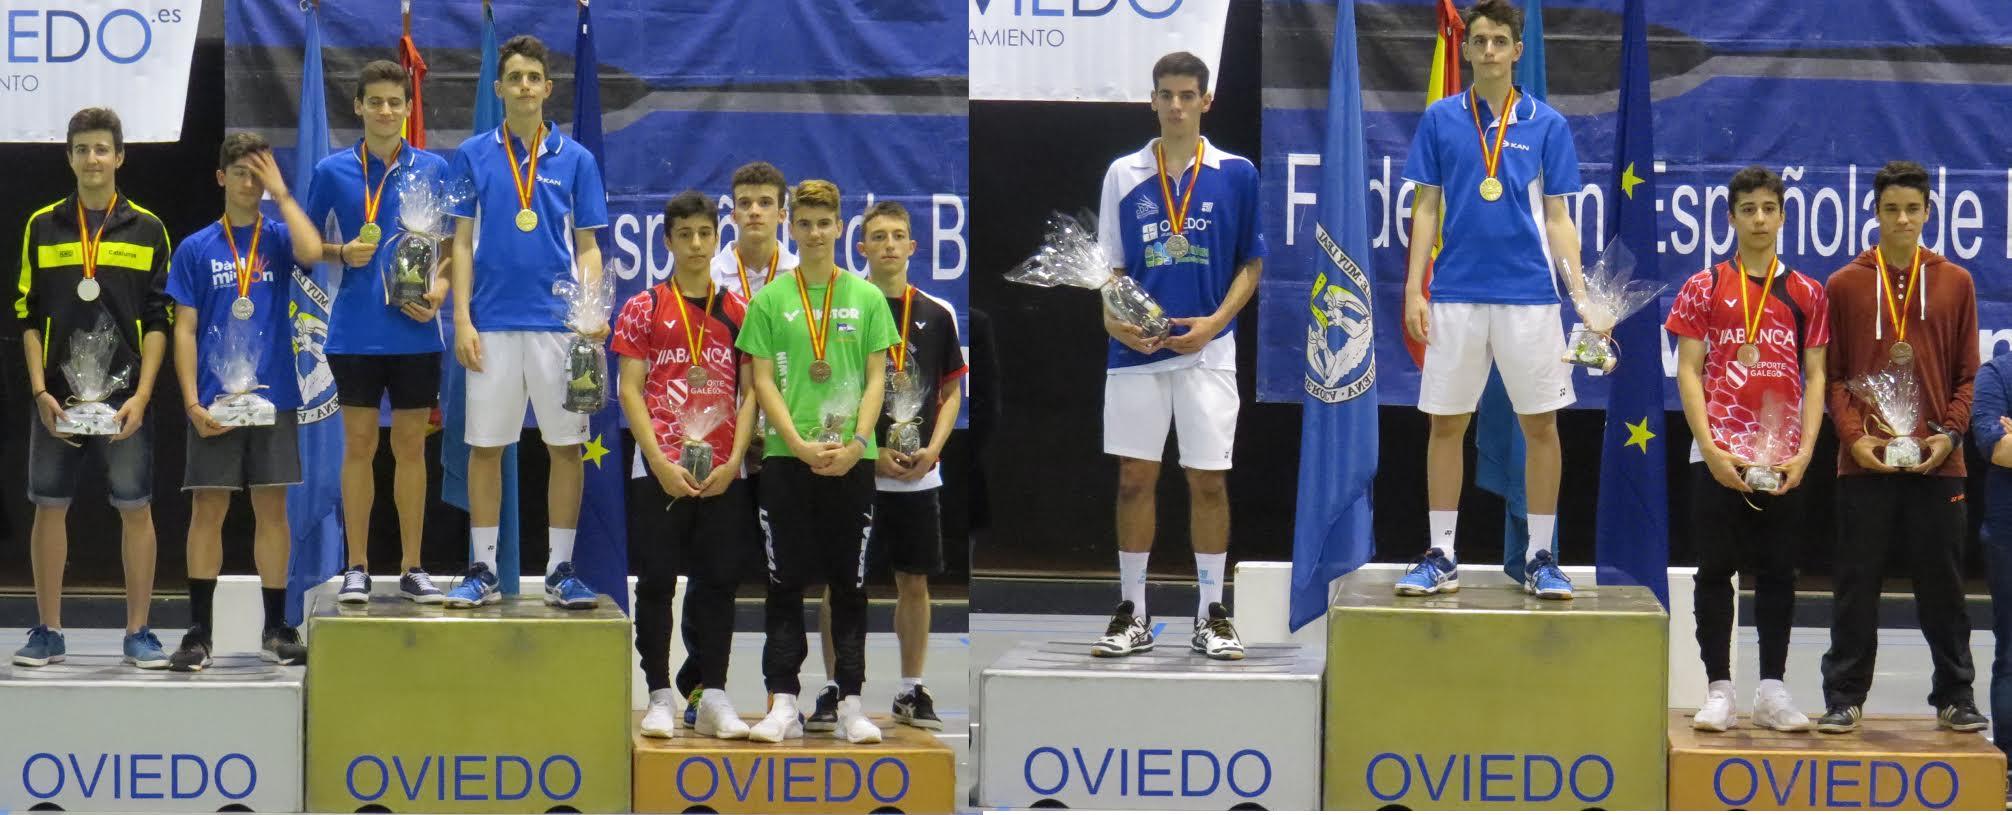 podio im Oviedo oro